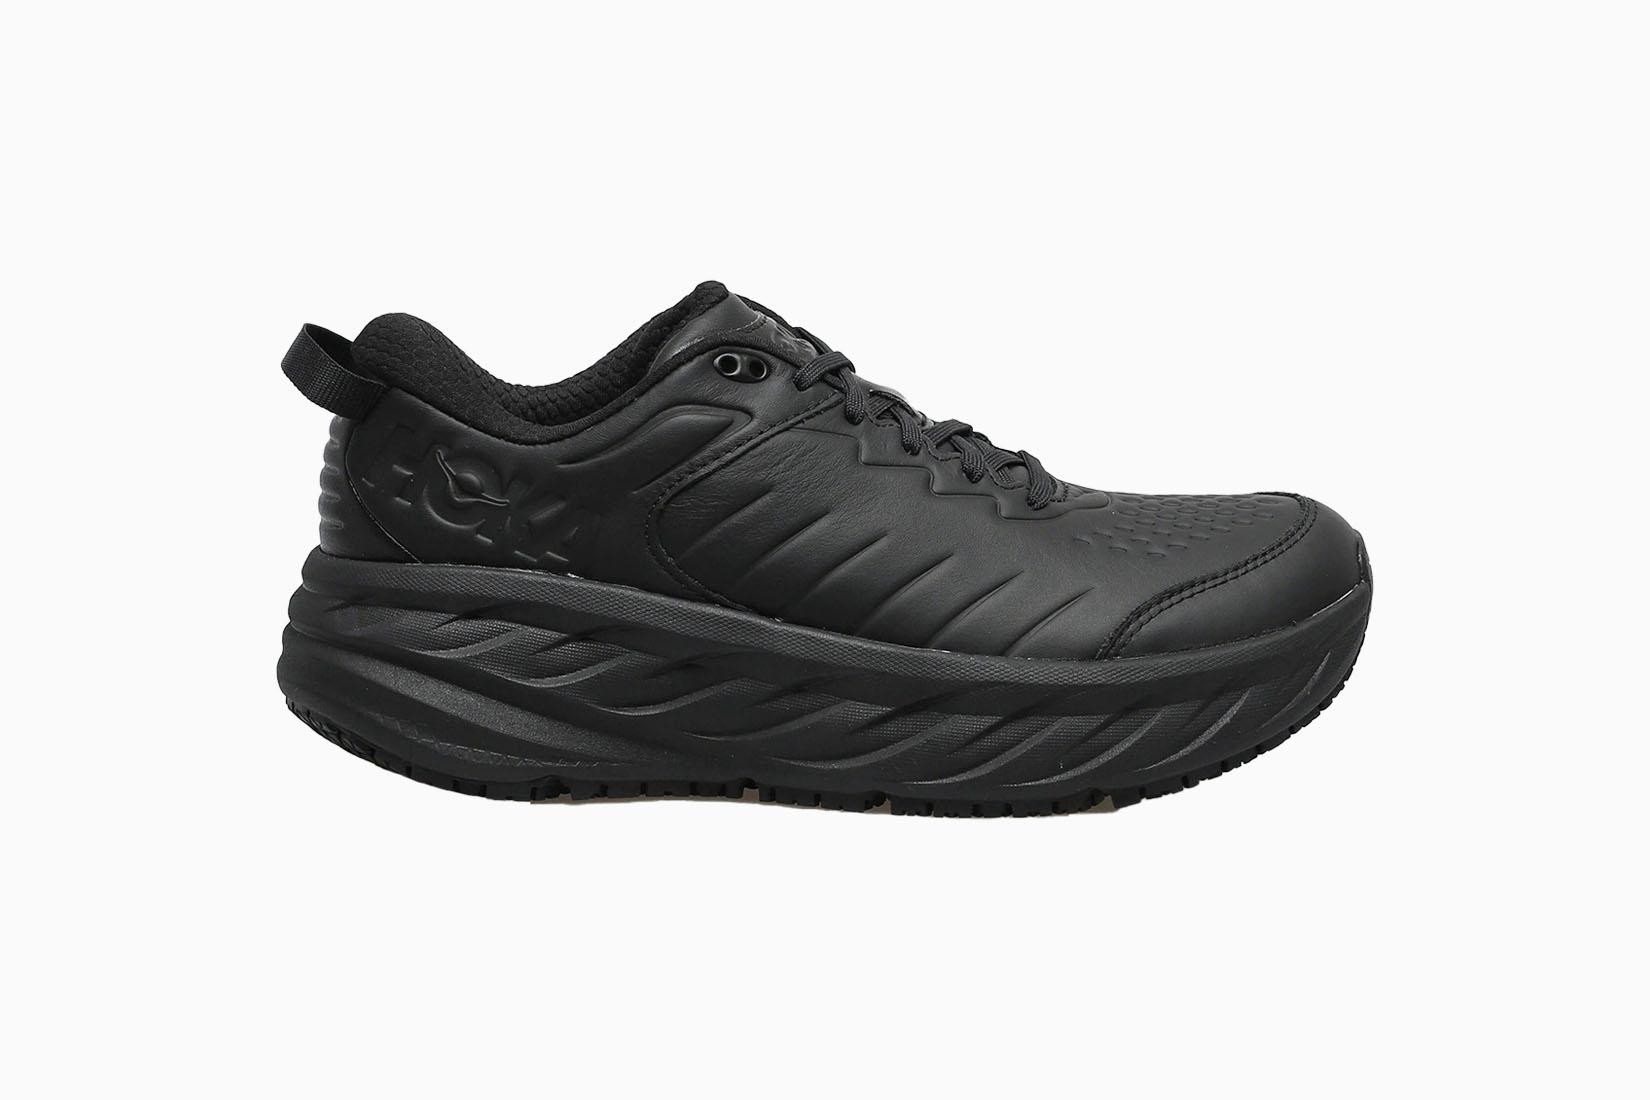 best waterproof shoes men hoka one one review Luxe Digital